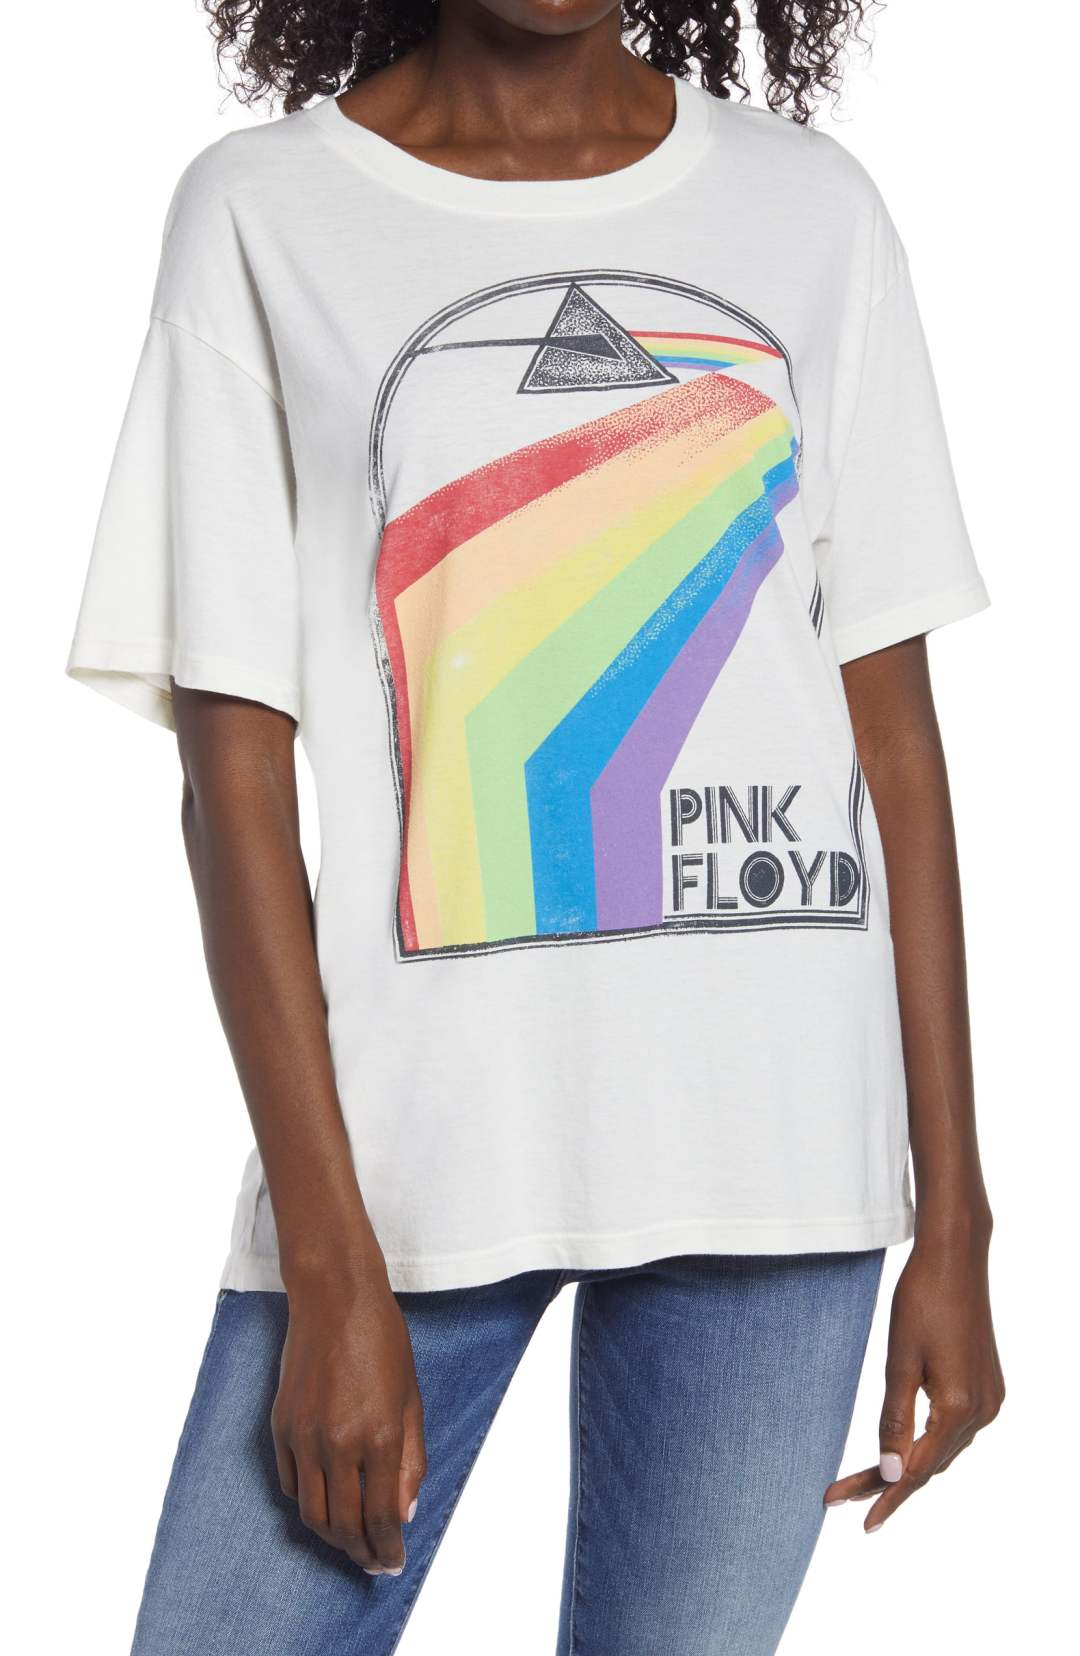 Daydreamer Pink Floyd Retro Rainbow Boyfriend Graphic Tee